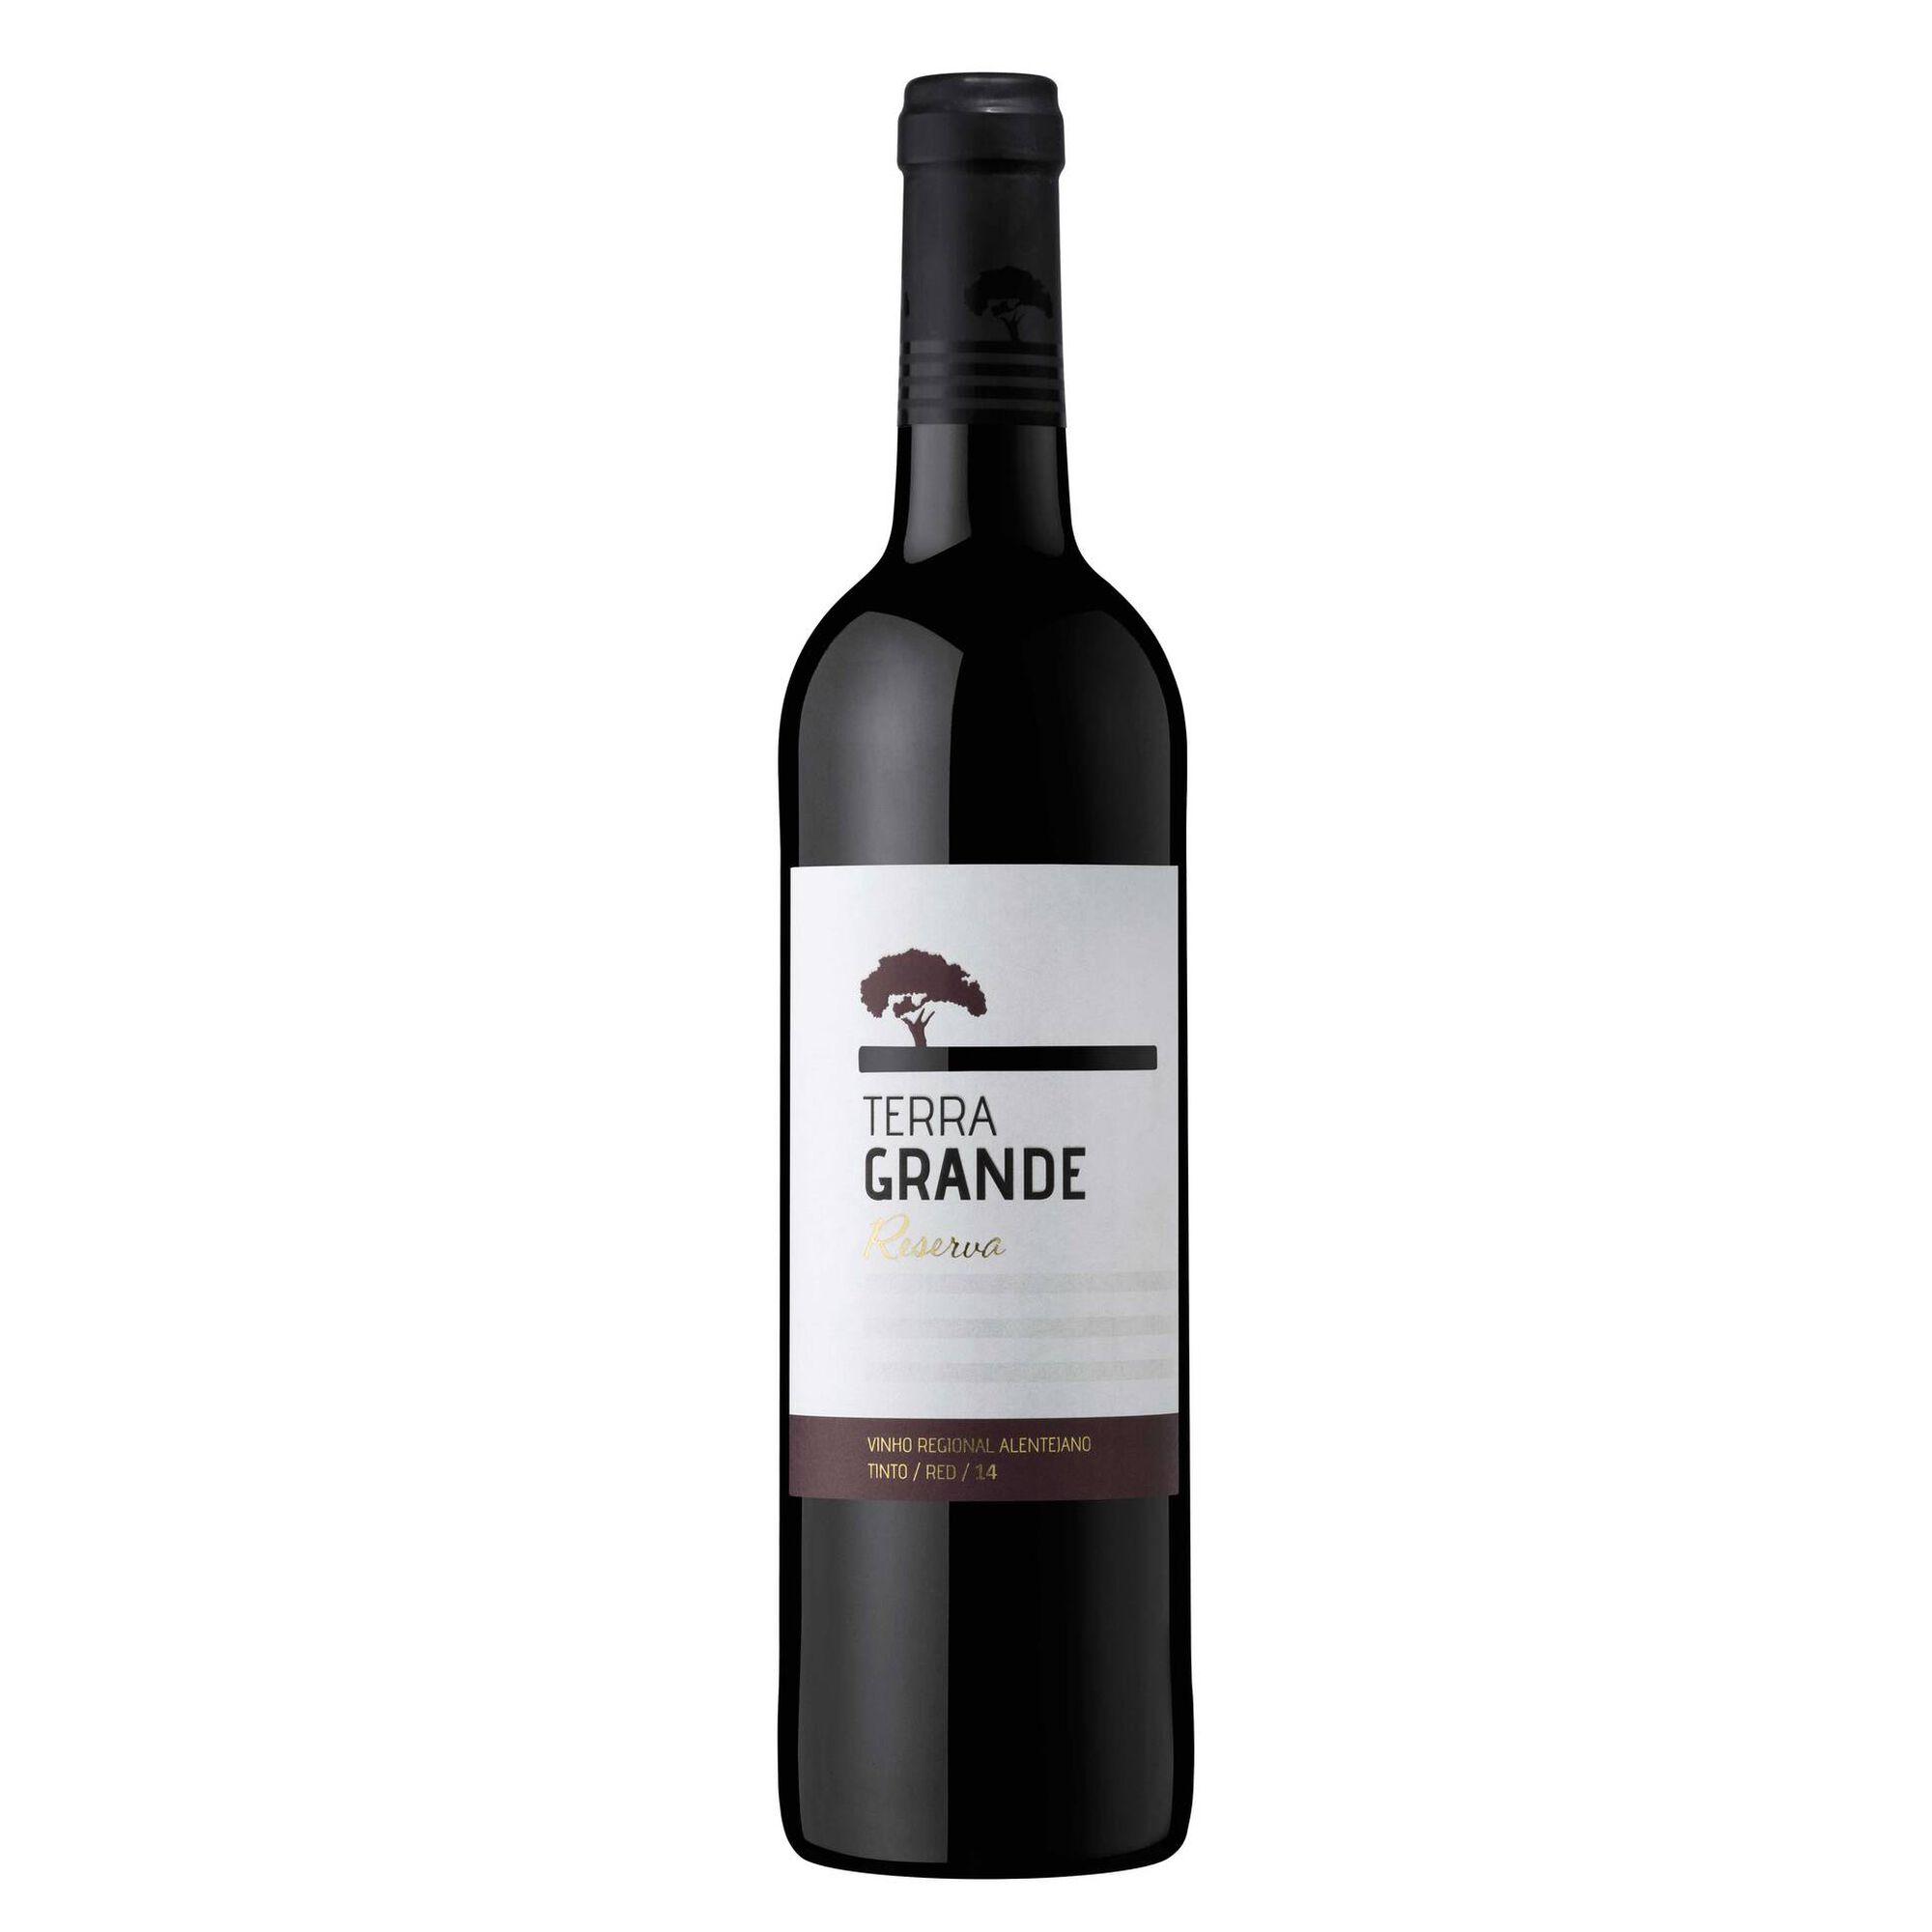 Terra Grande Reserva Regional Alentejano Vinho Tinto